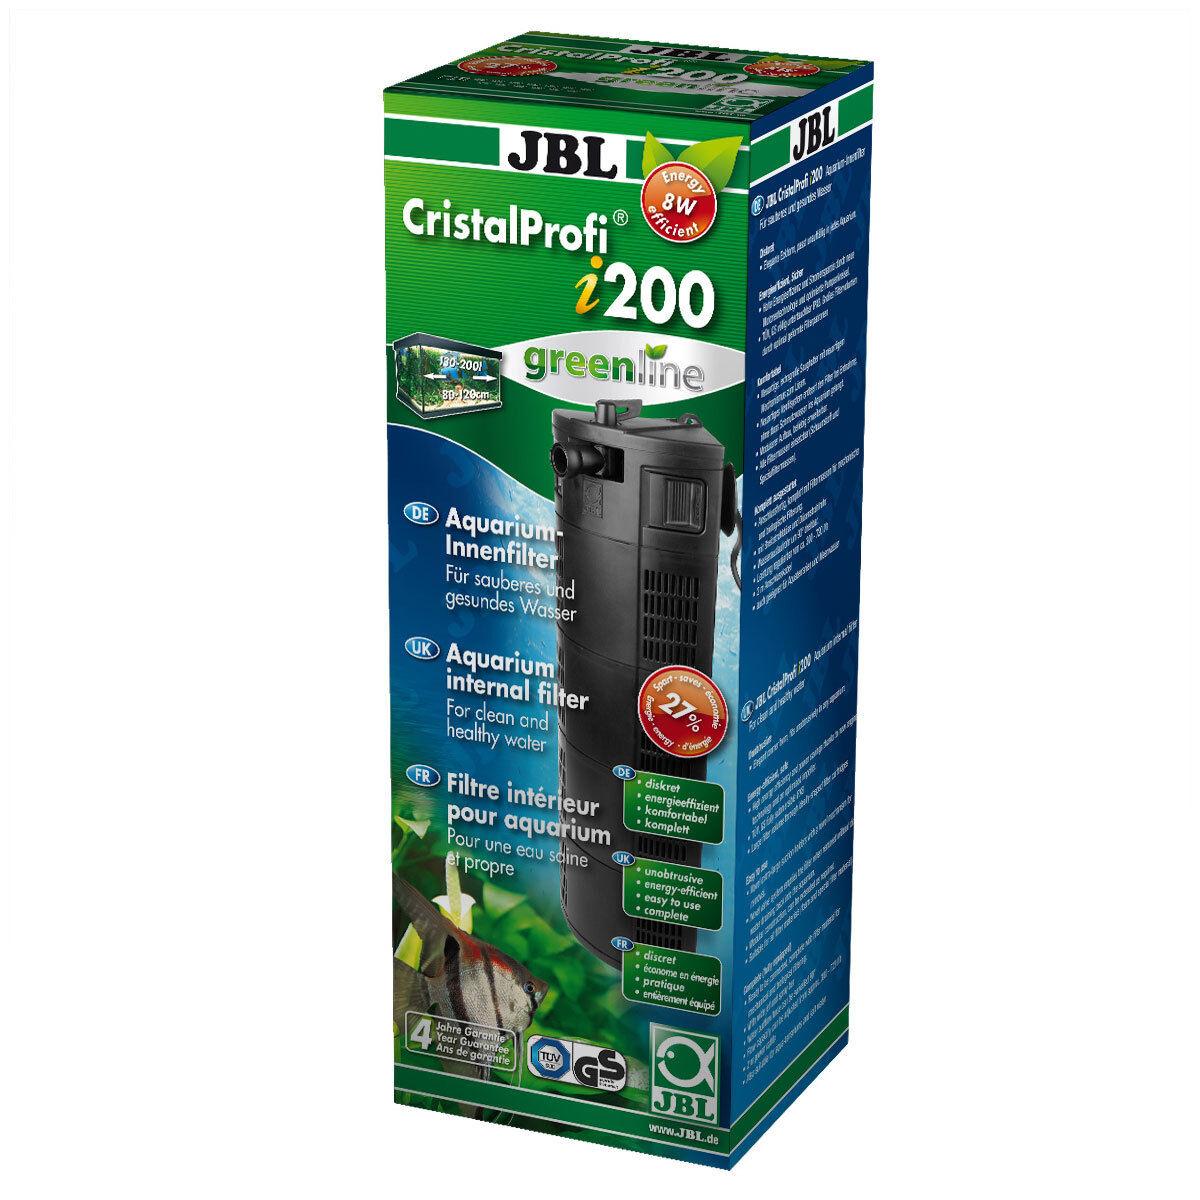 JBL Cristal Profi I200 Greenline, Filtre Intérieur pour 130-200l Aquariums